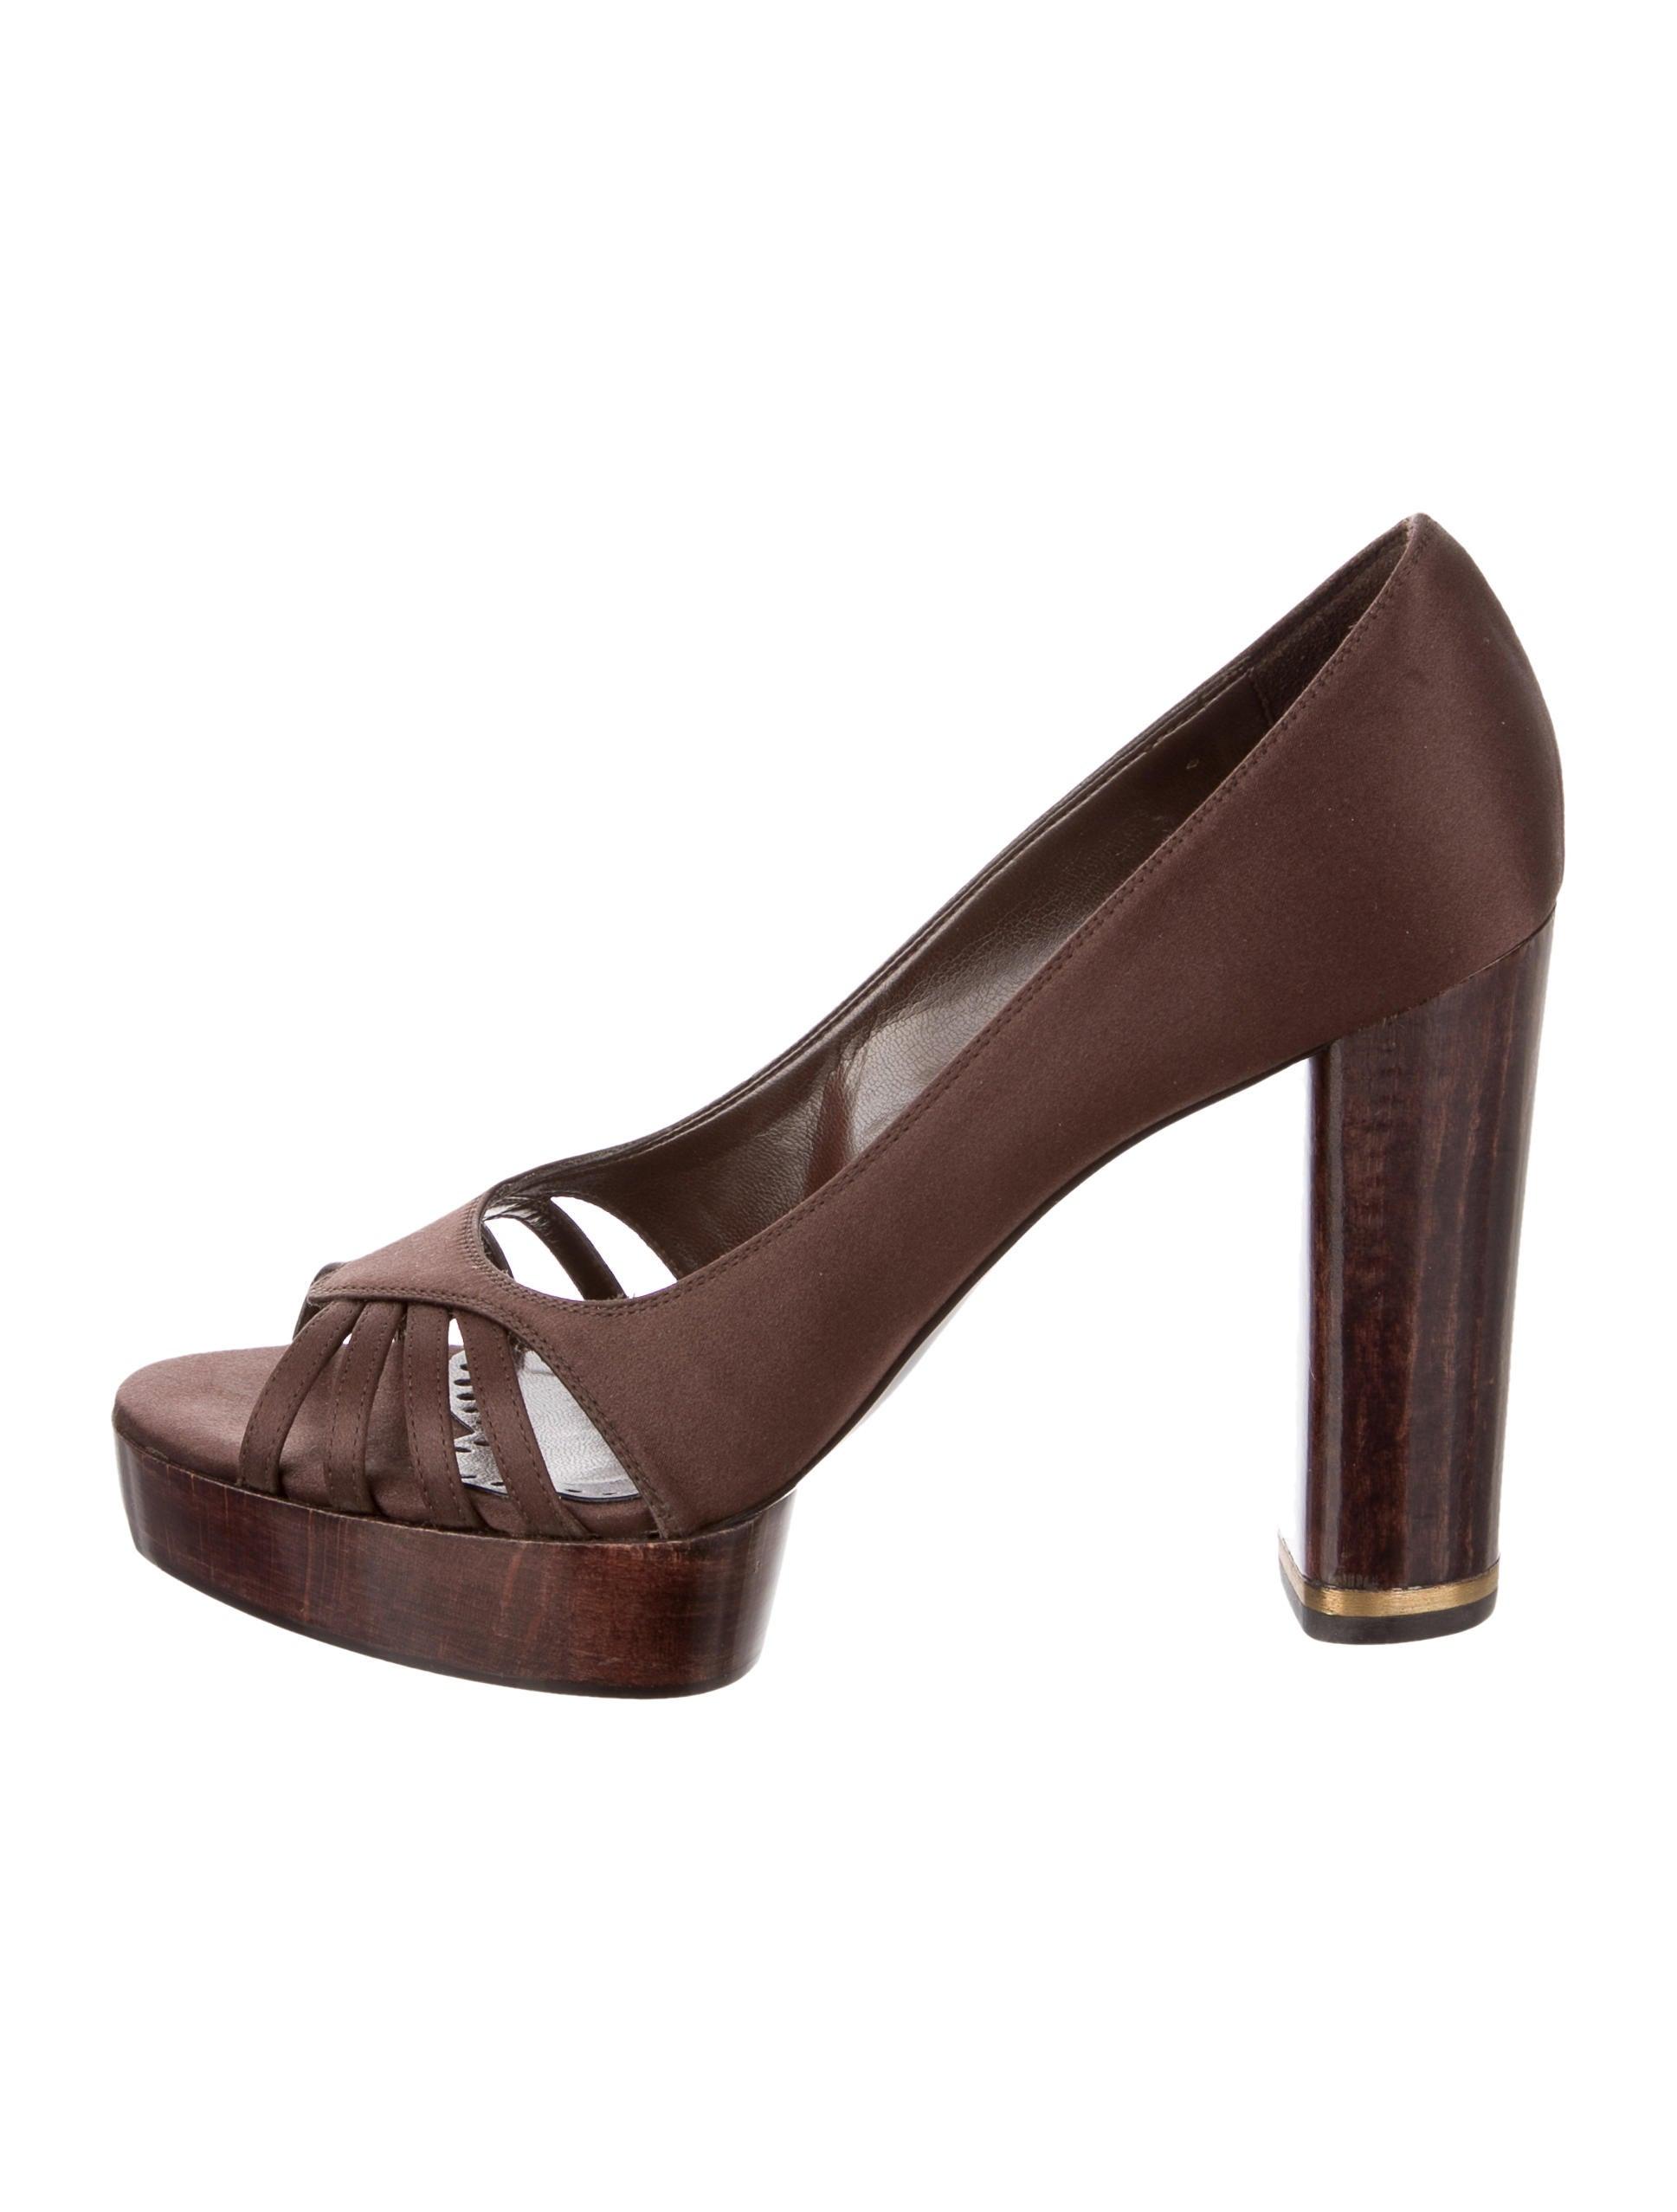 cheap price fake footaction cheap price Stella McCartney Satin Peep-Toe Pumps perfect online mHeFTM